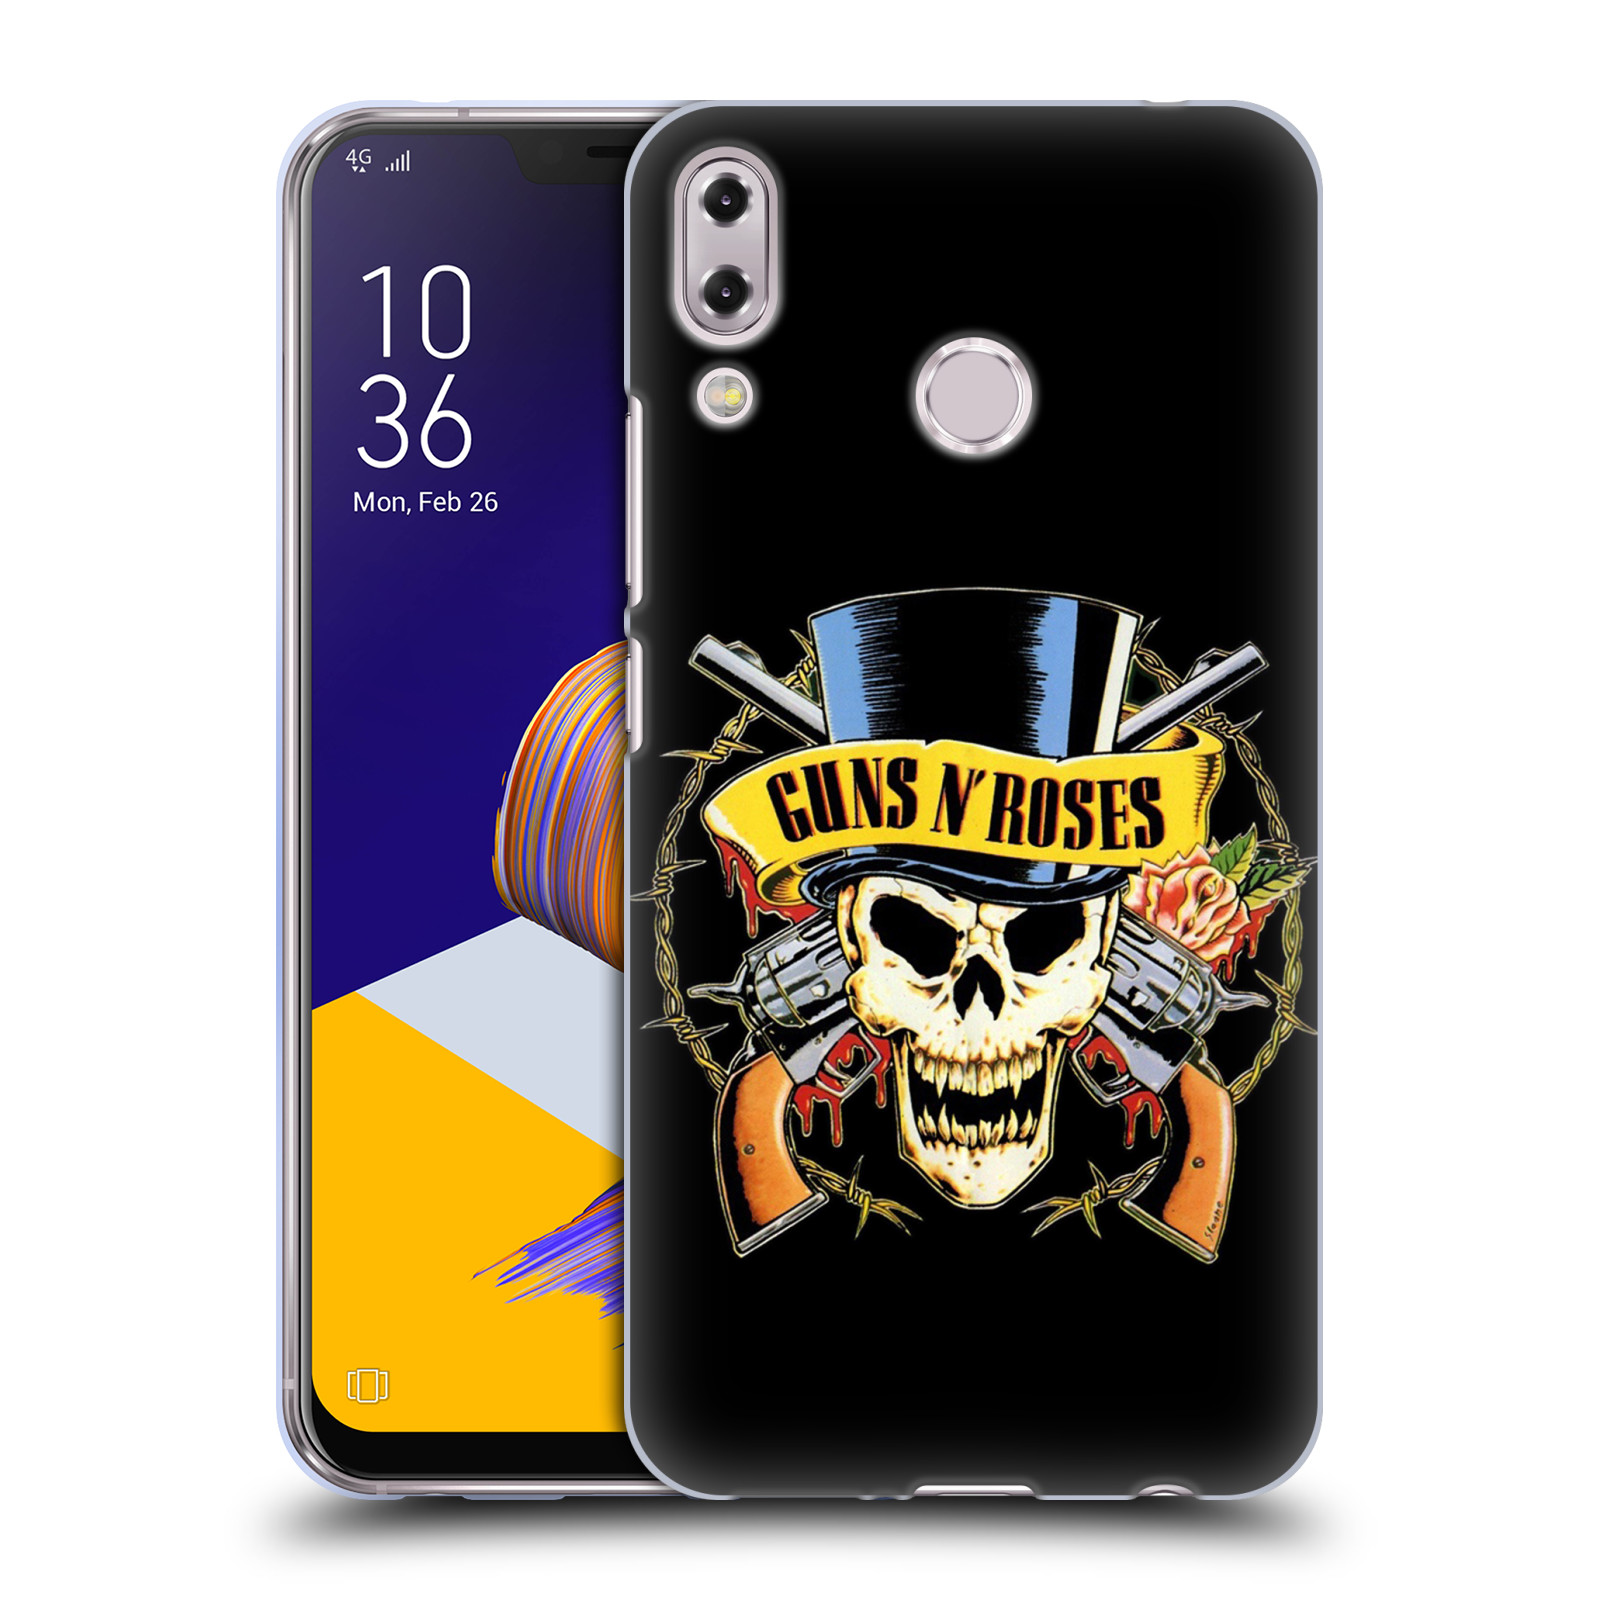 Silikonové pouzdro na mobil Asus ZenFone 5 ZE620KL - Head Case - Guns N' Roses - Lebka